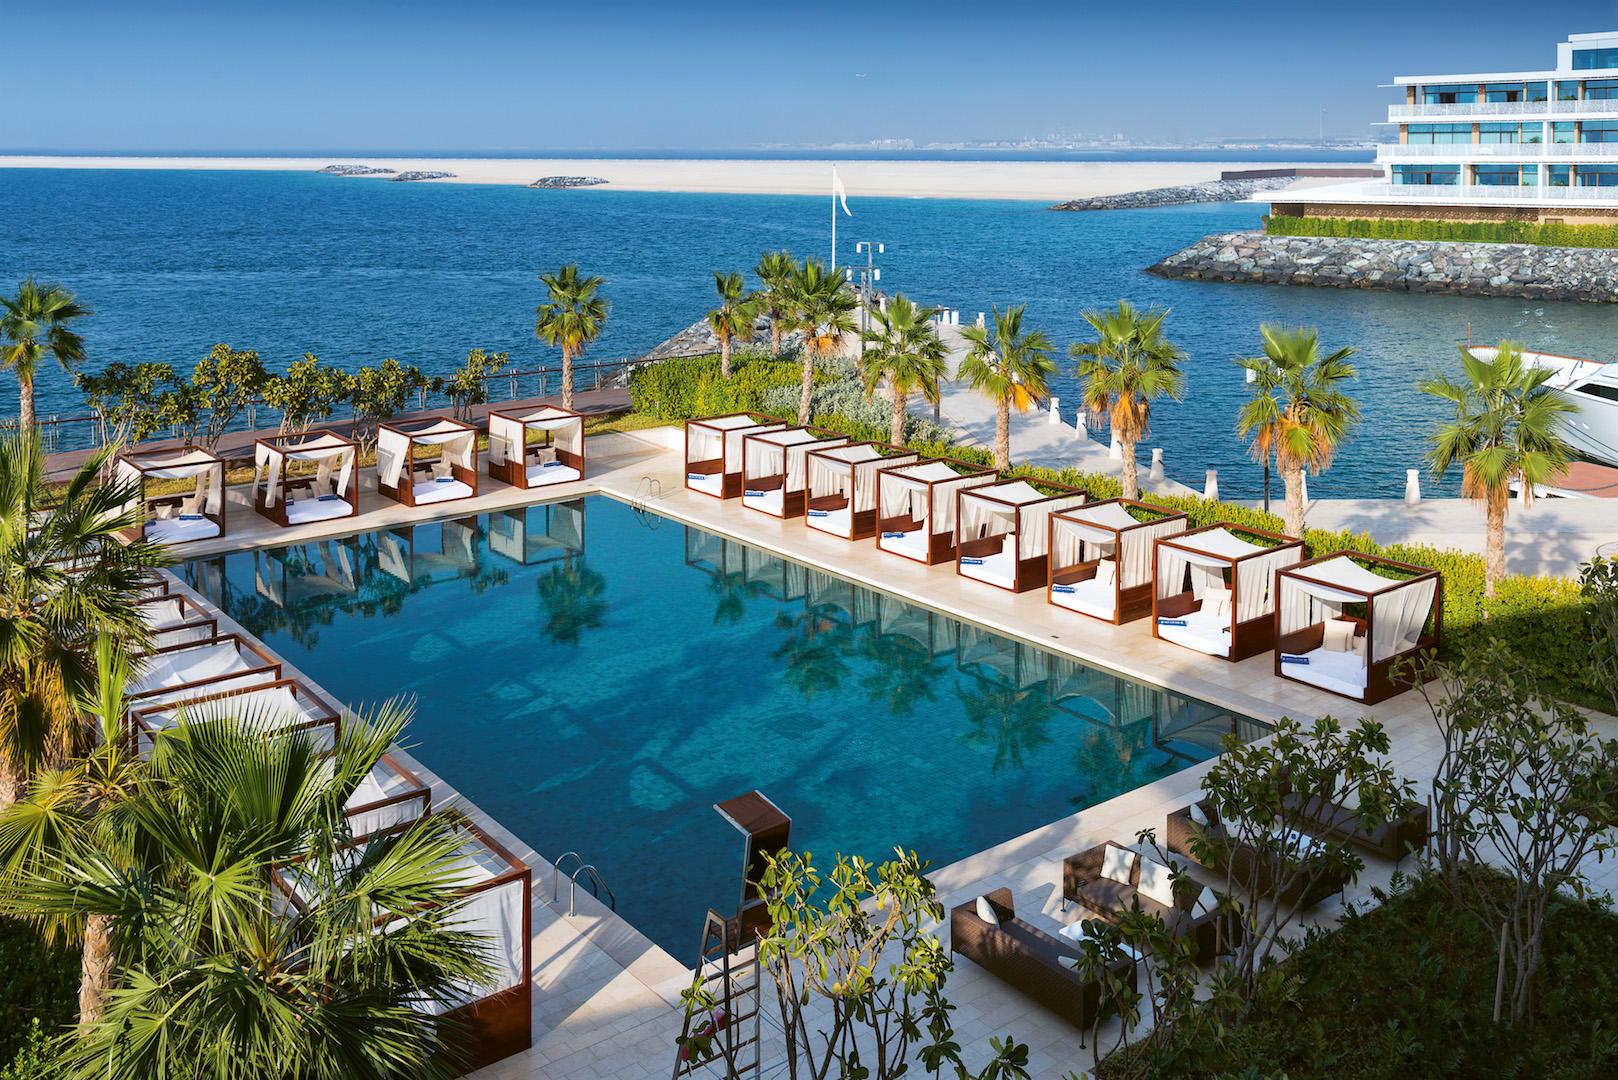 Bvlgari Resort Dubai-Yacht Club Dubai